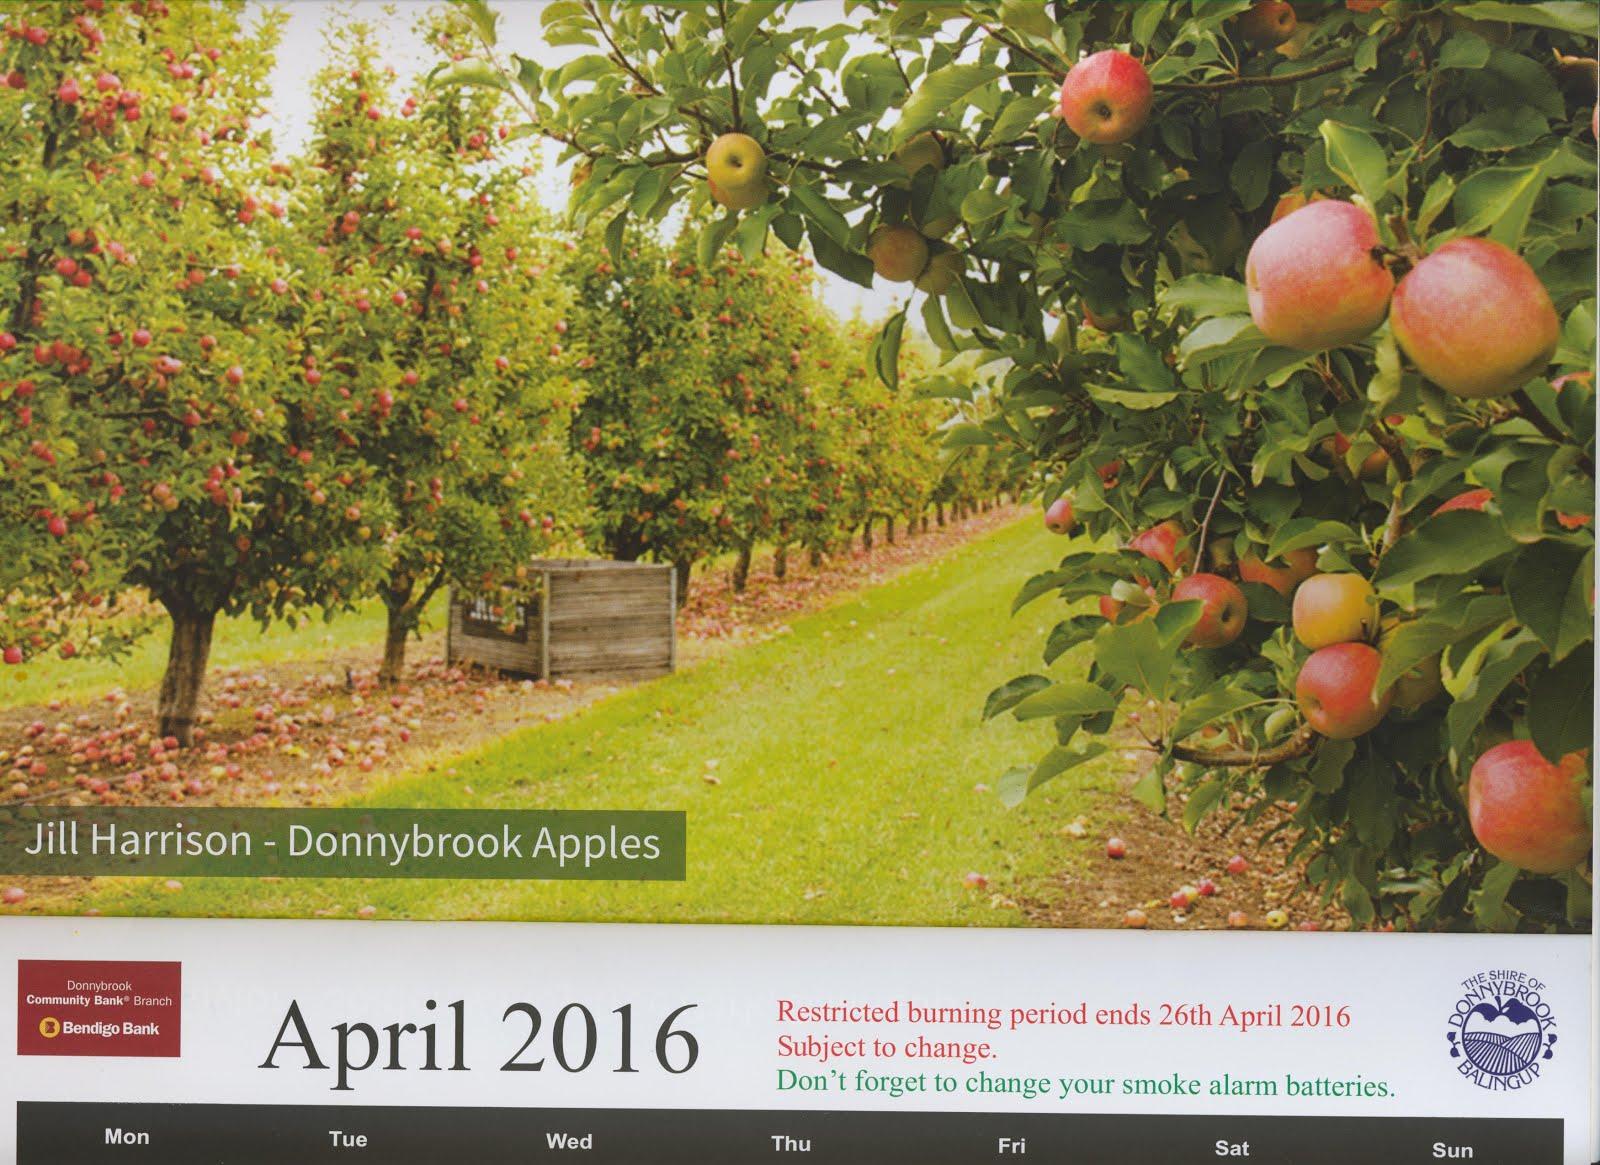 Donnybrook-Balingup Shire 2016 calendar